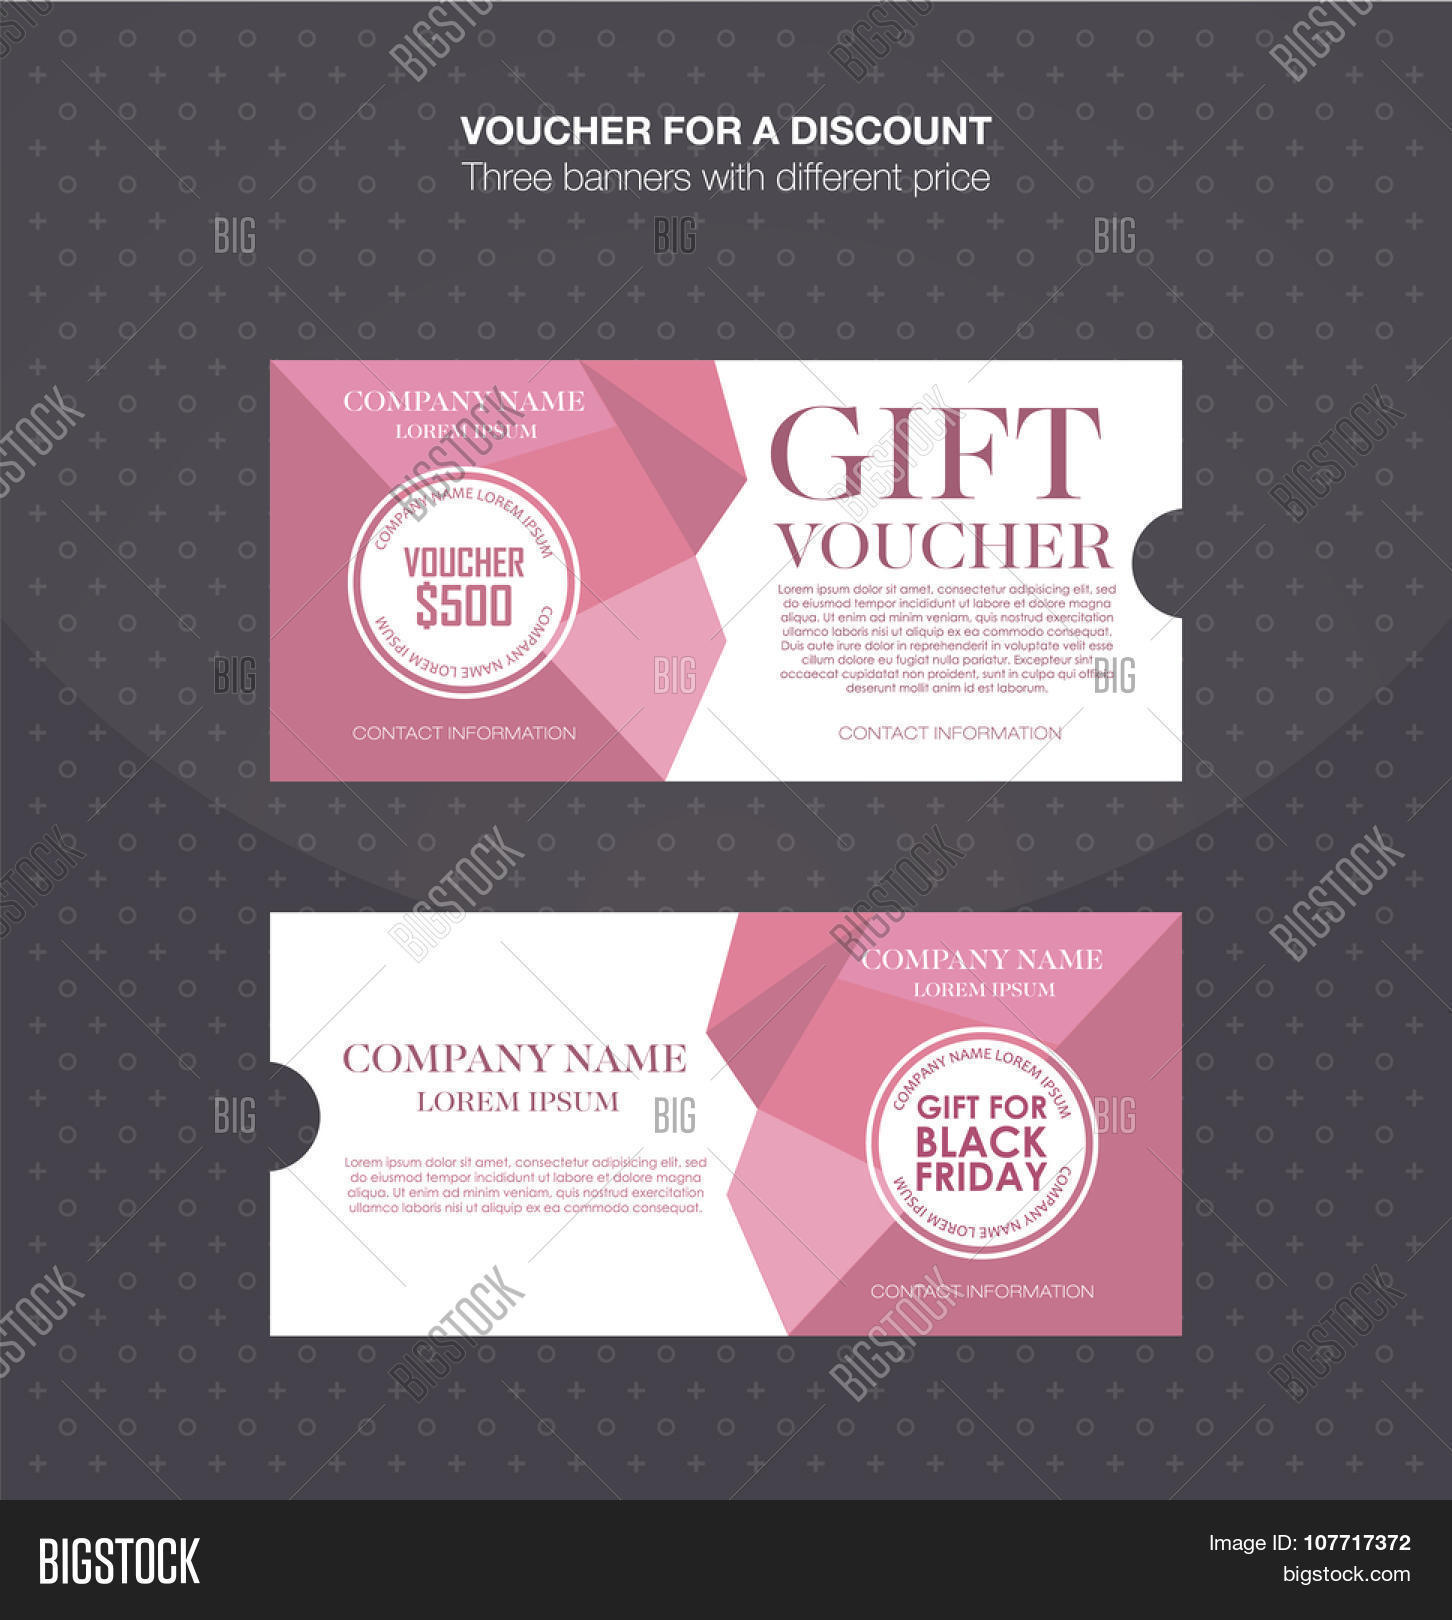 gift voucher template discount card cash coupon gift gift voucher template discount card cash coupon gift certificate vector illustration